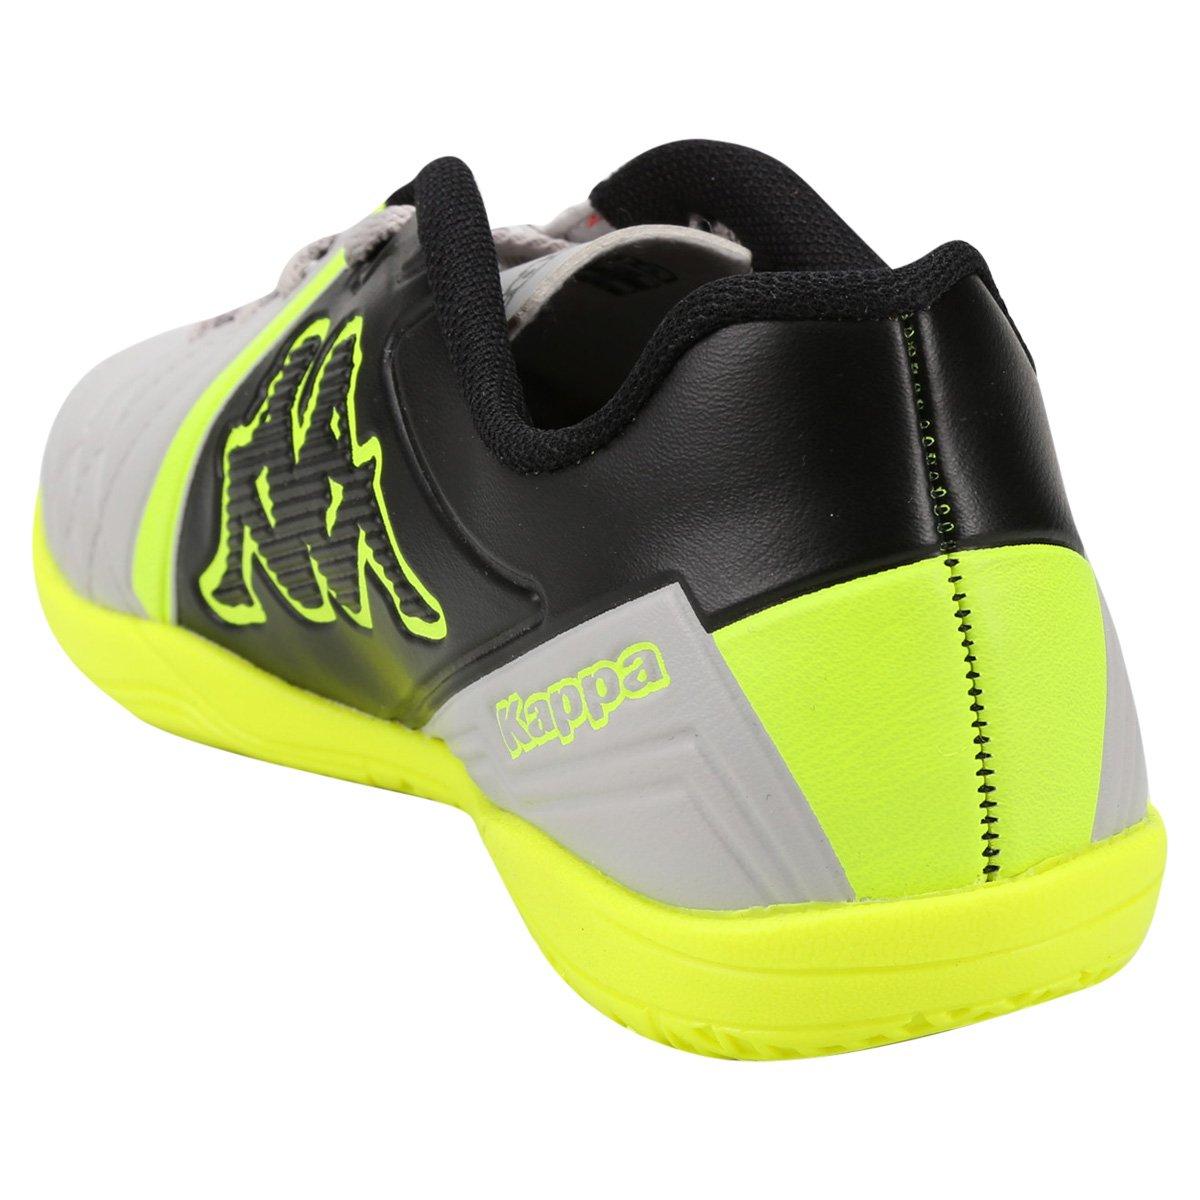 ee5956198e Chuteira Futsal Infantil Kappa Avanti - Compre Agora